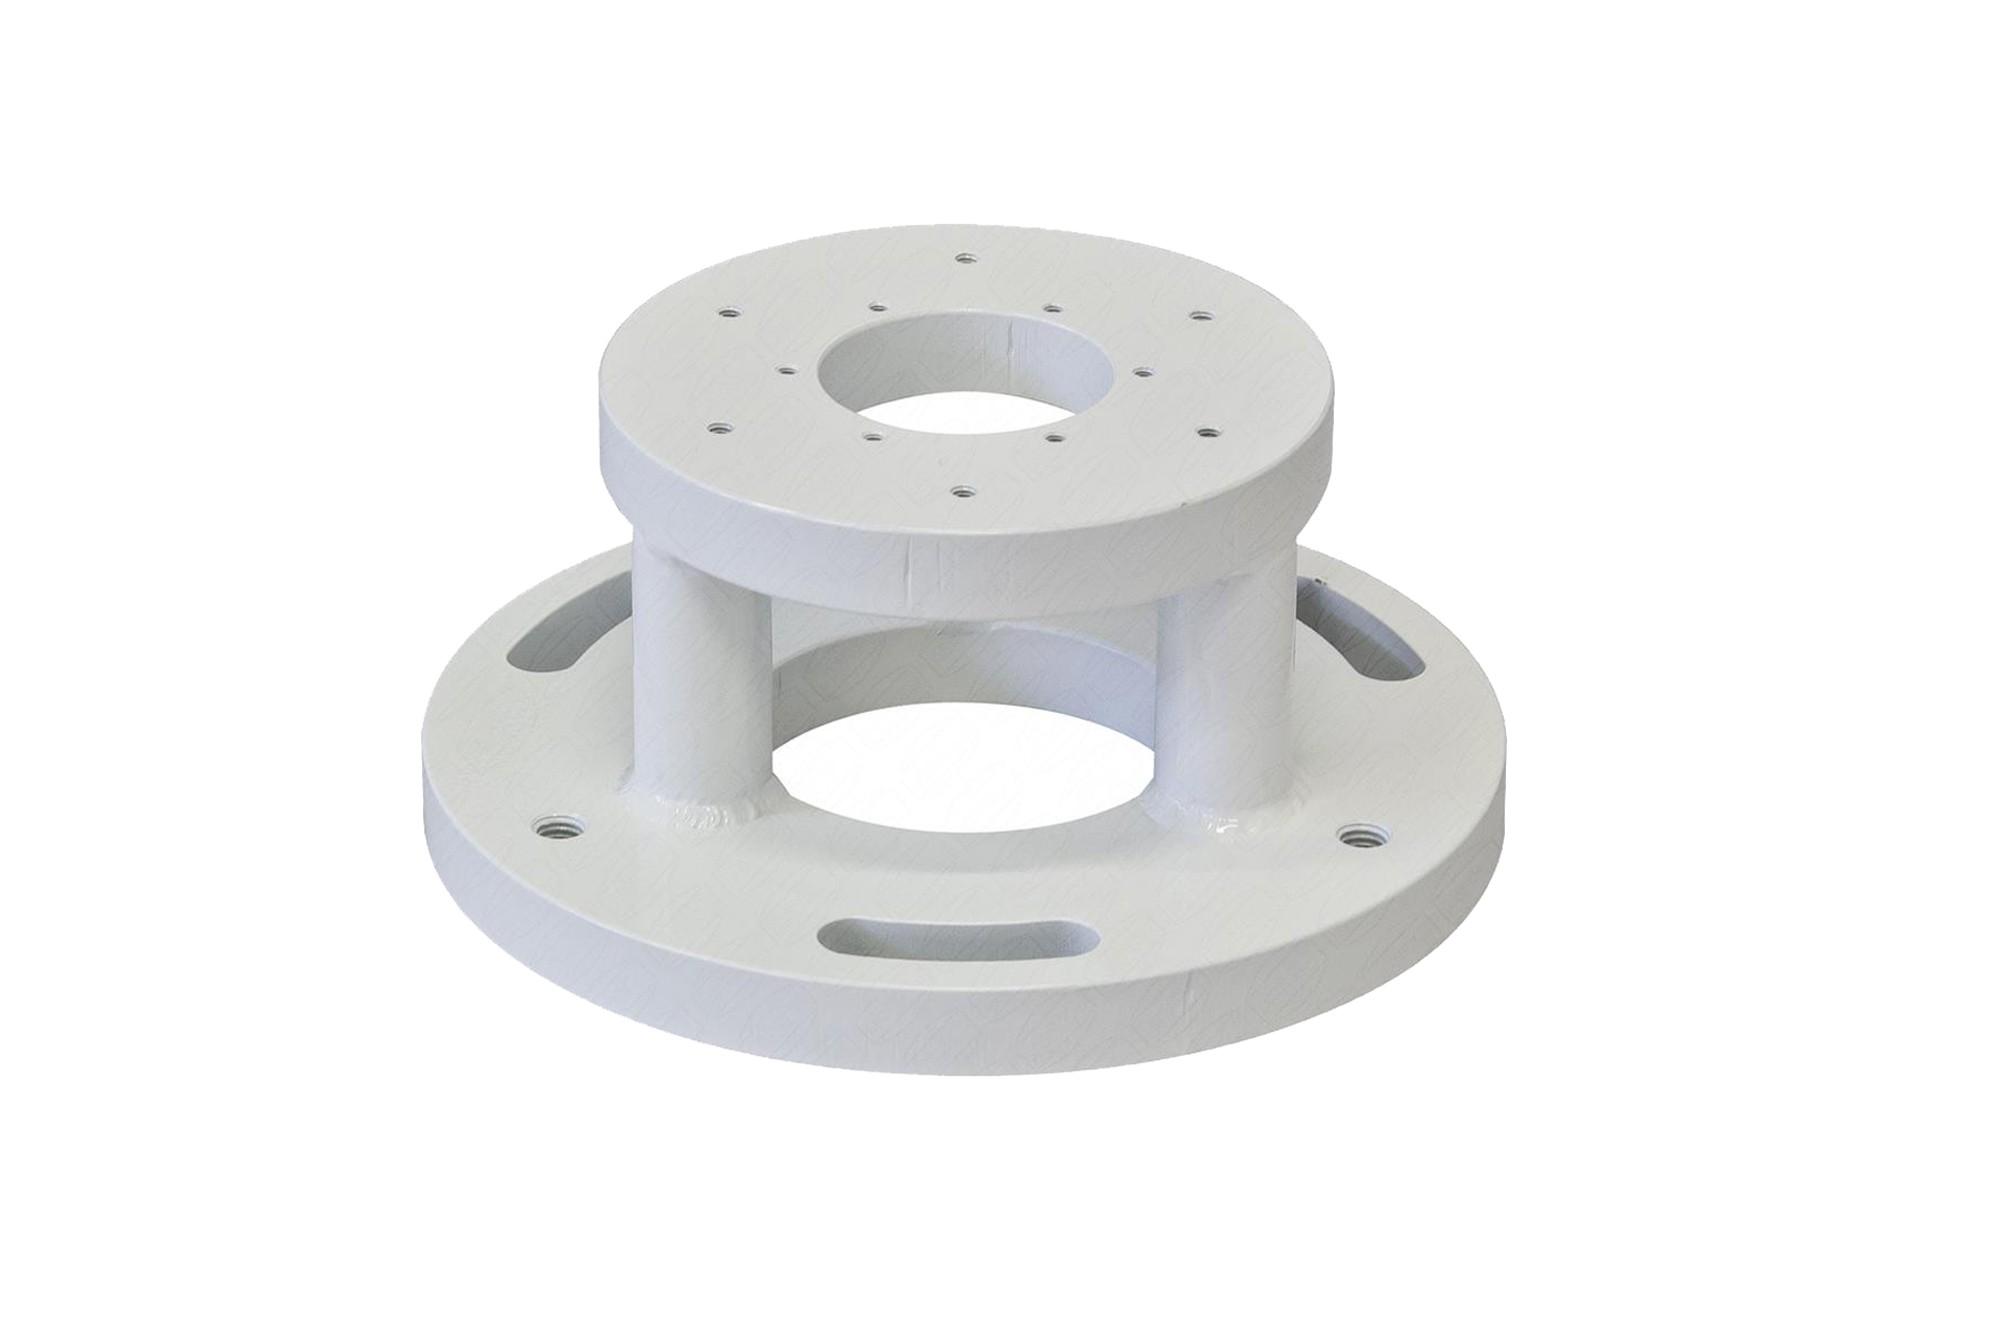 Baader Medium Pillar (BMP) Levelling Flange for GM 1000